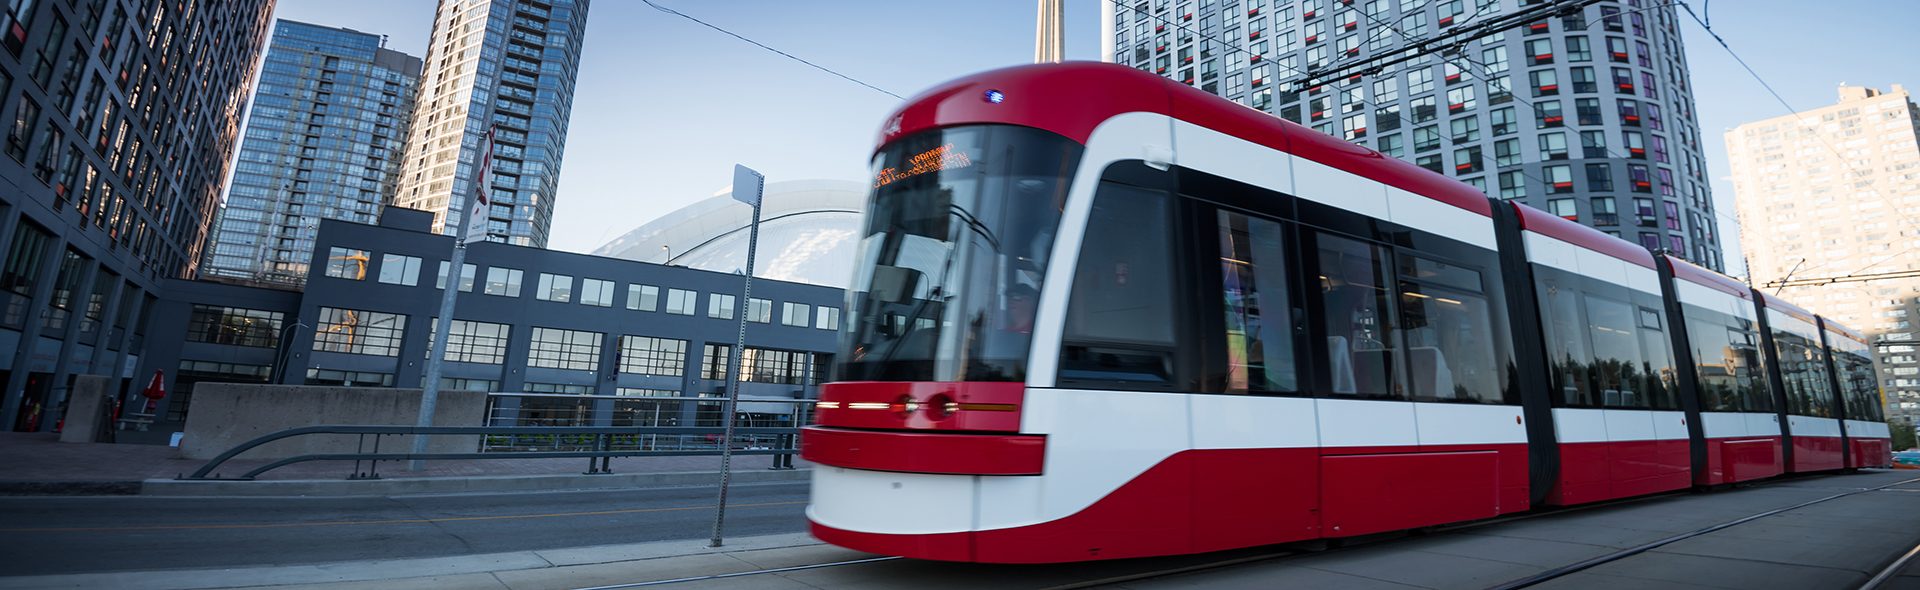 Modern Toronto street car